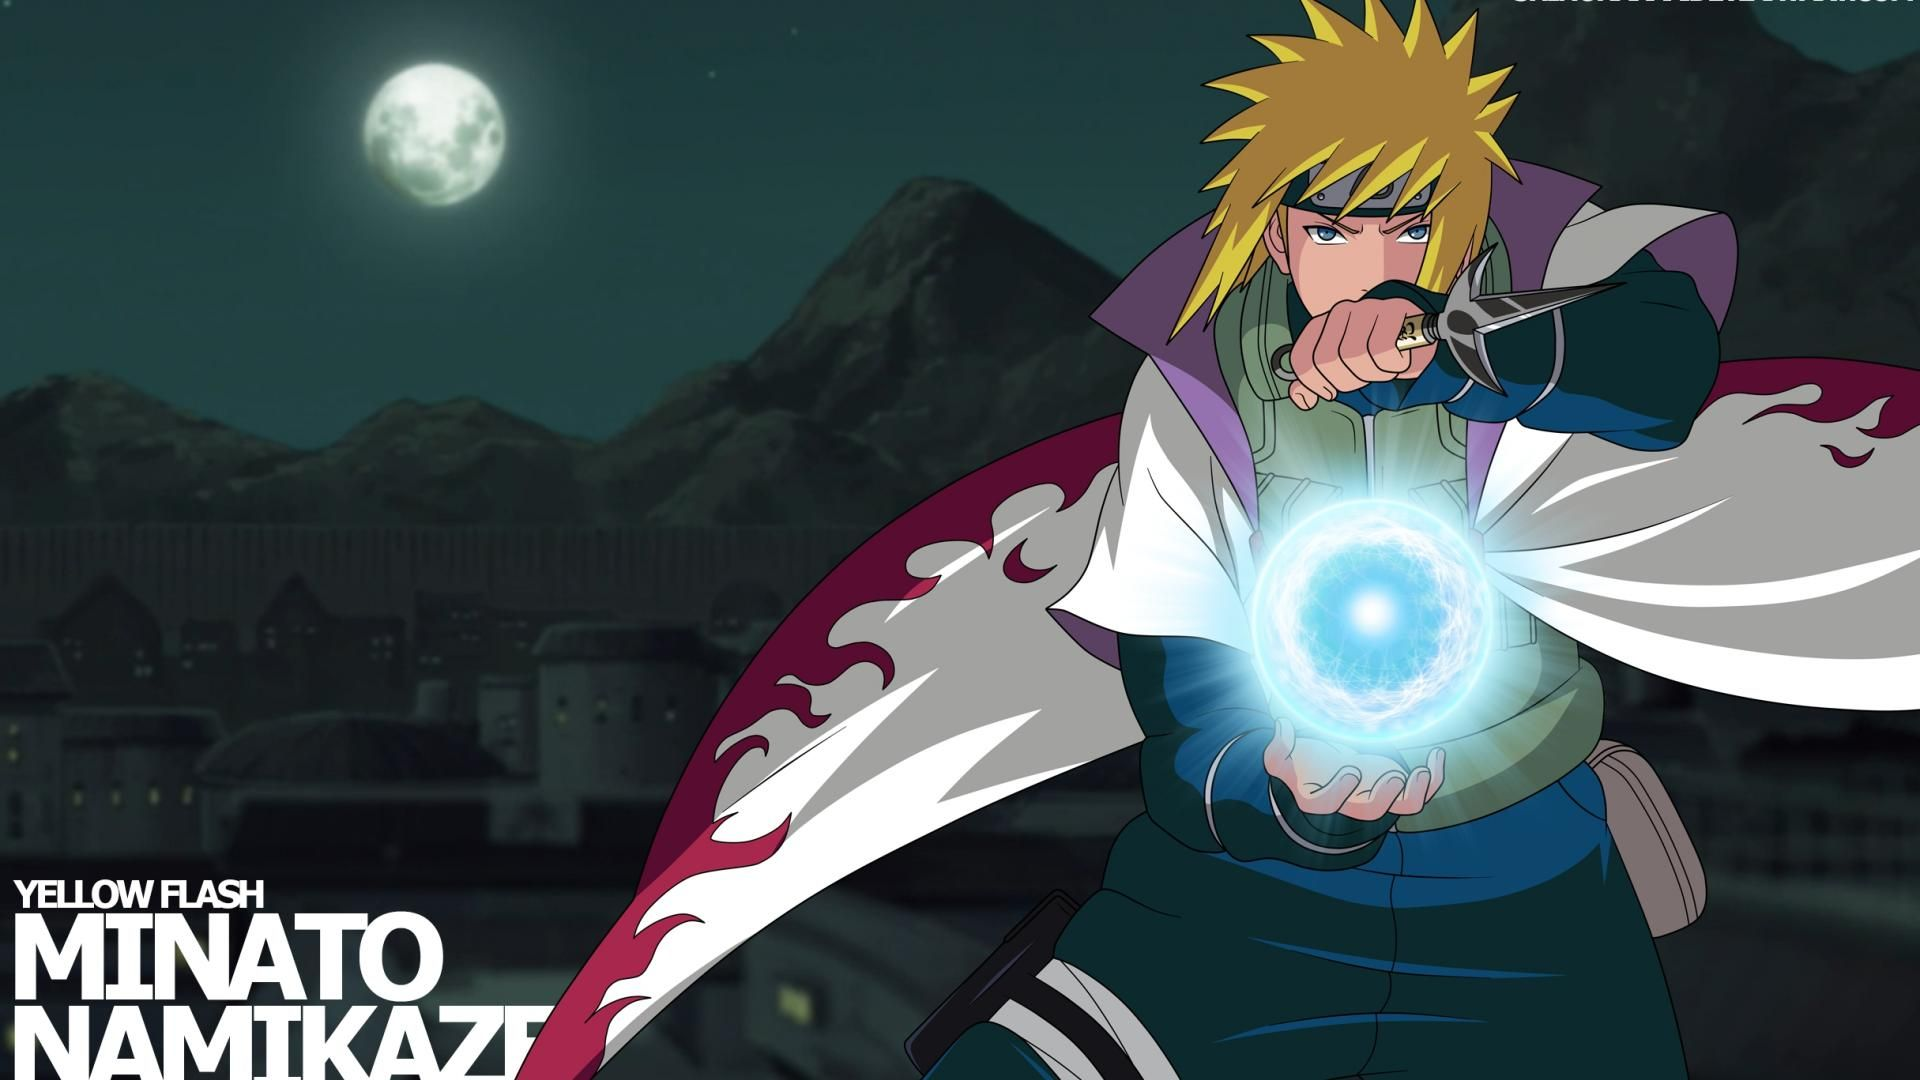 Top Wallpaper Naruto 1080p - 75d0dd62bca451157428b0b0412d0a69  Picture_99254.jpg